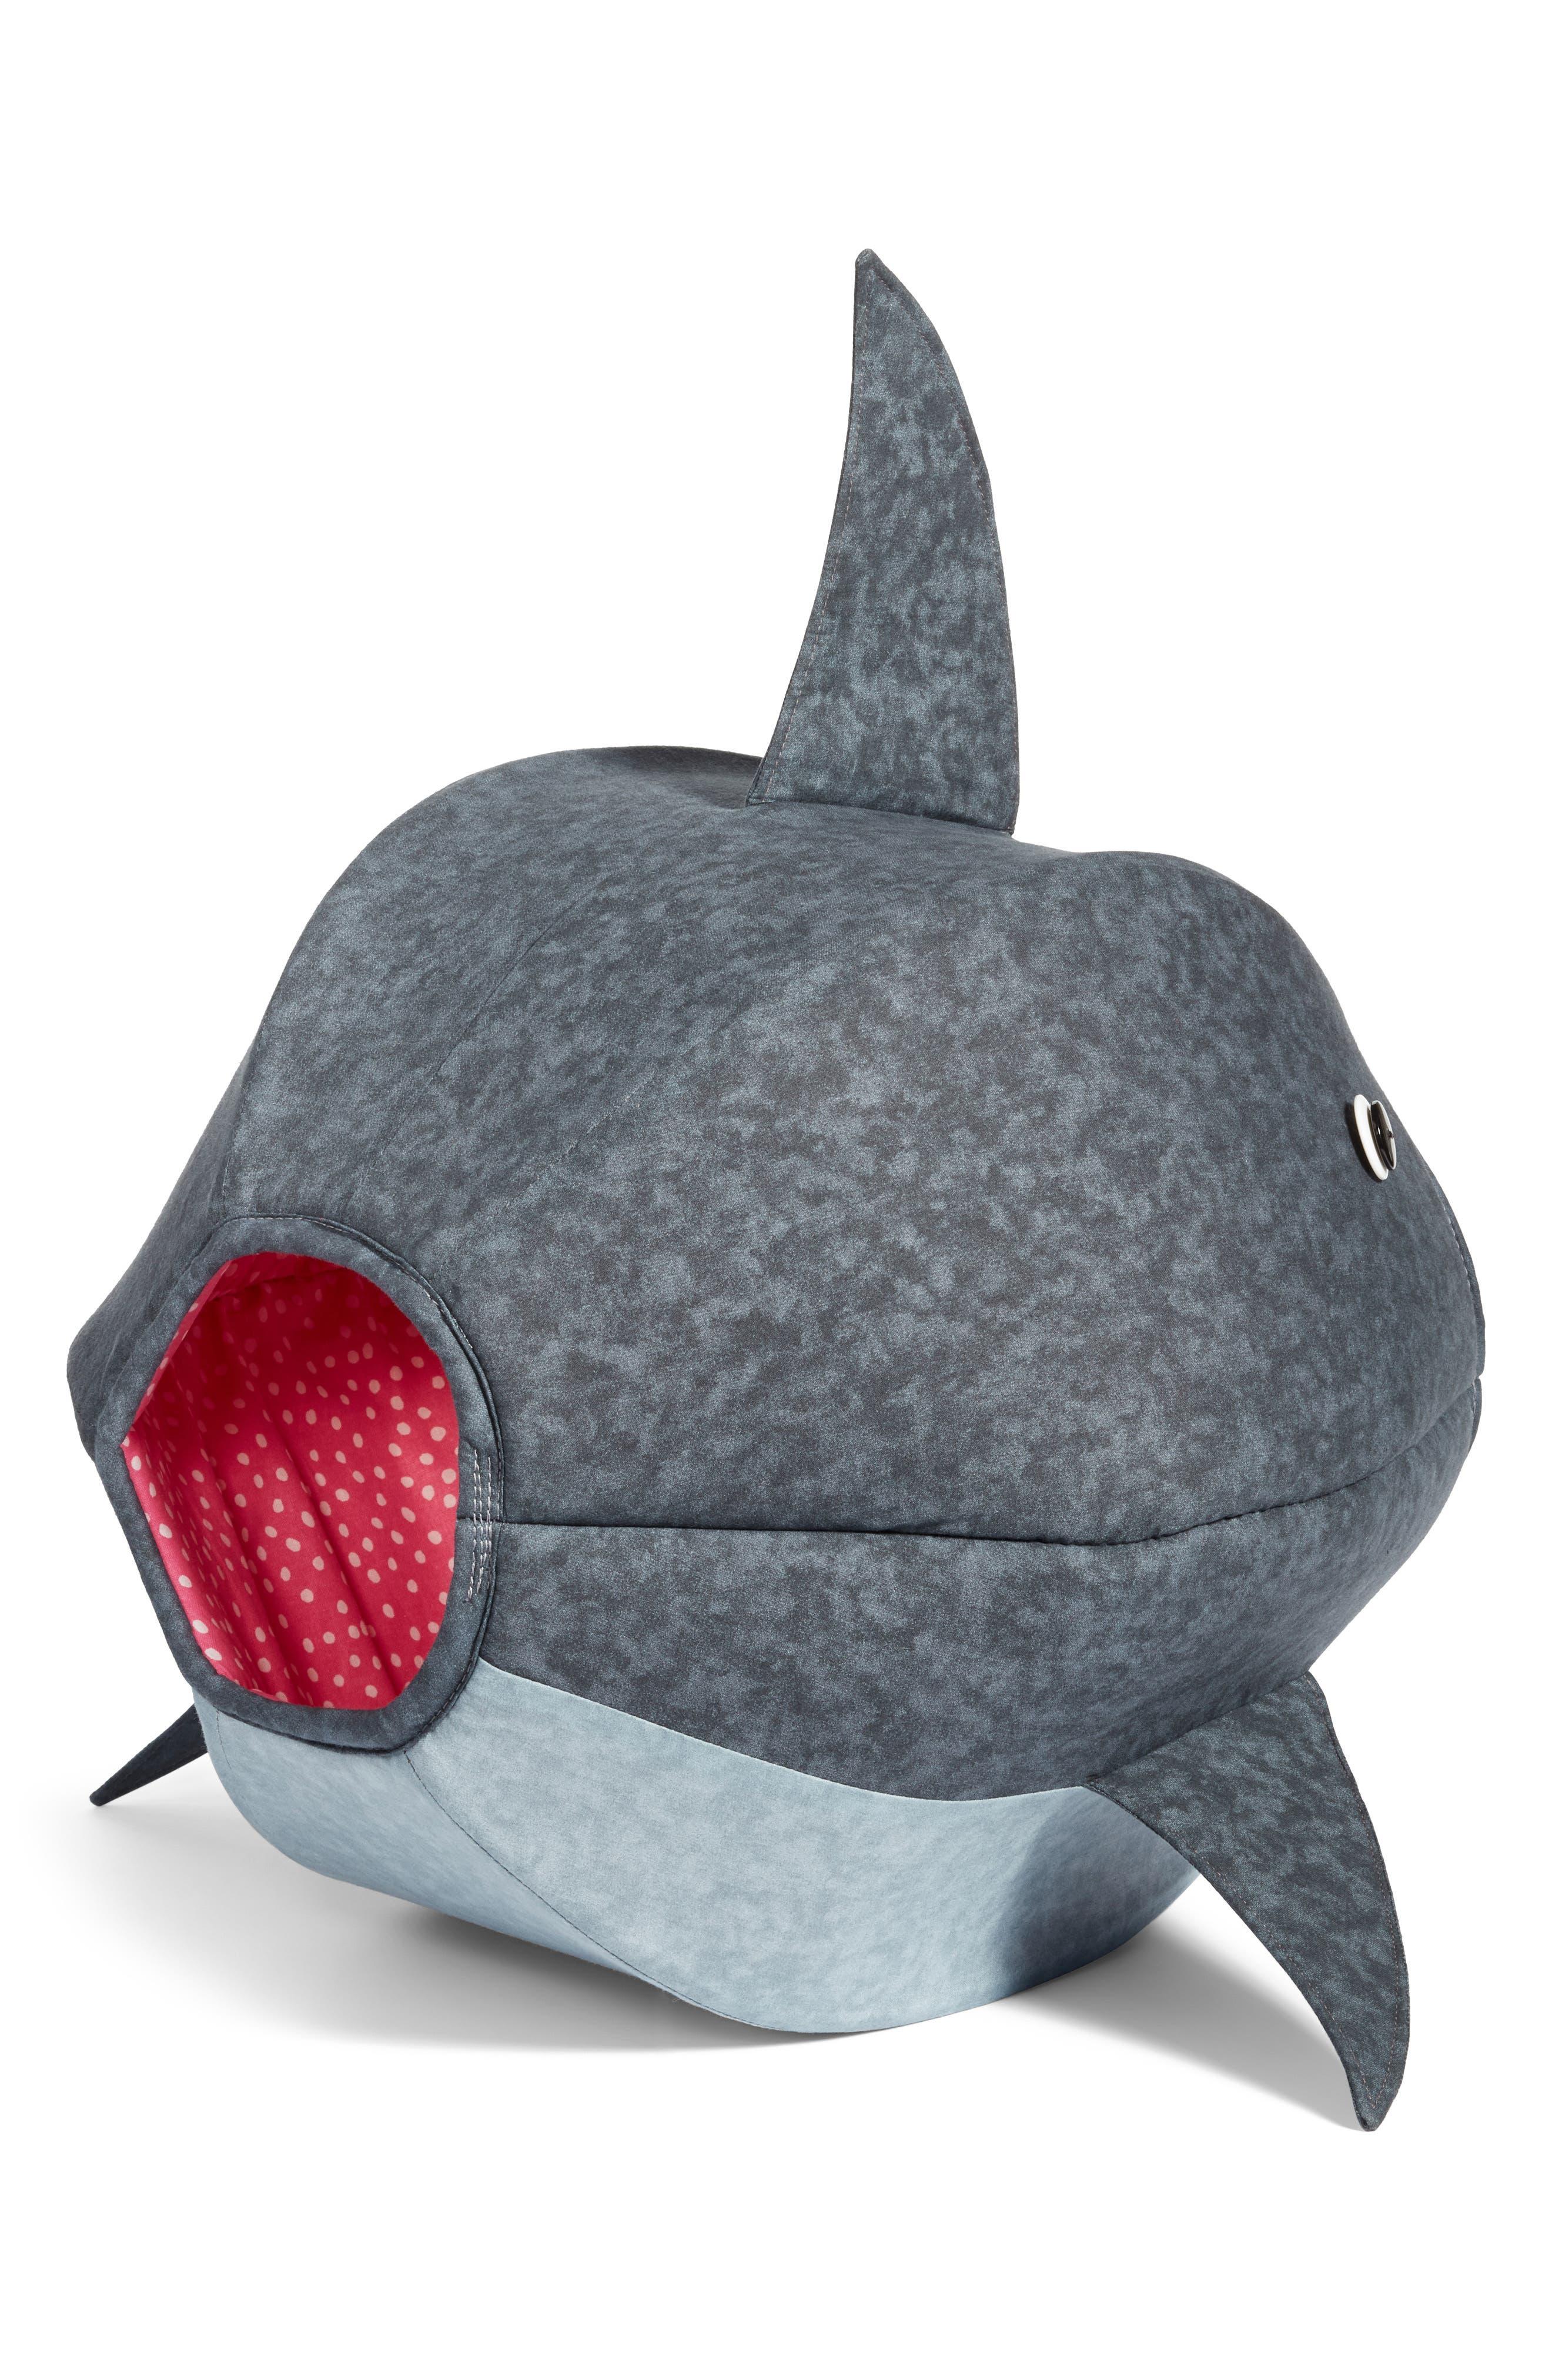 Great White Shark Cat Bed,                             Alternate thumbnail 2, color,                             020